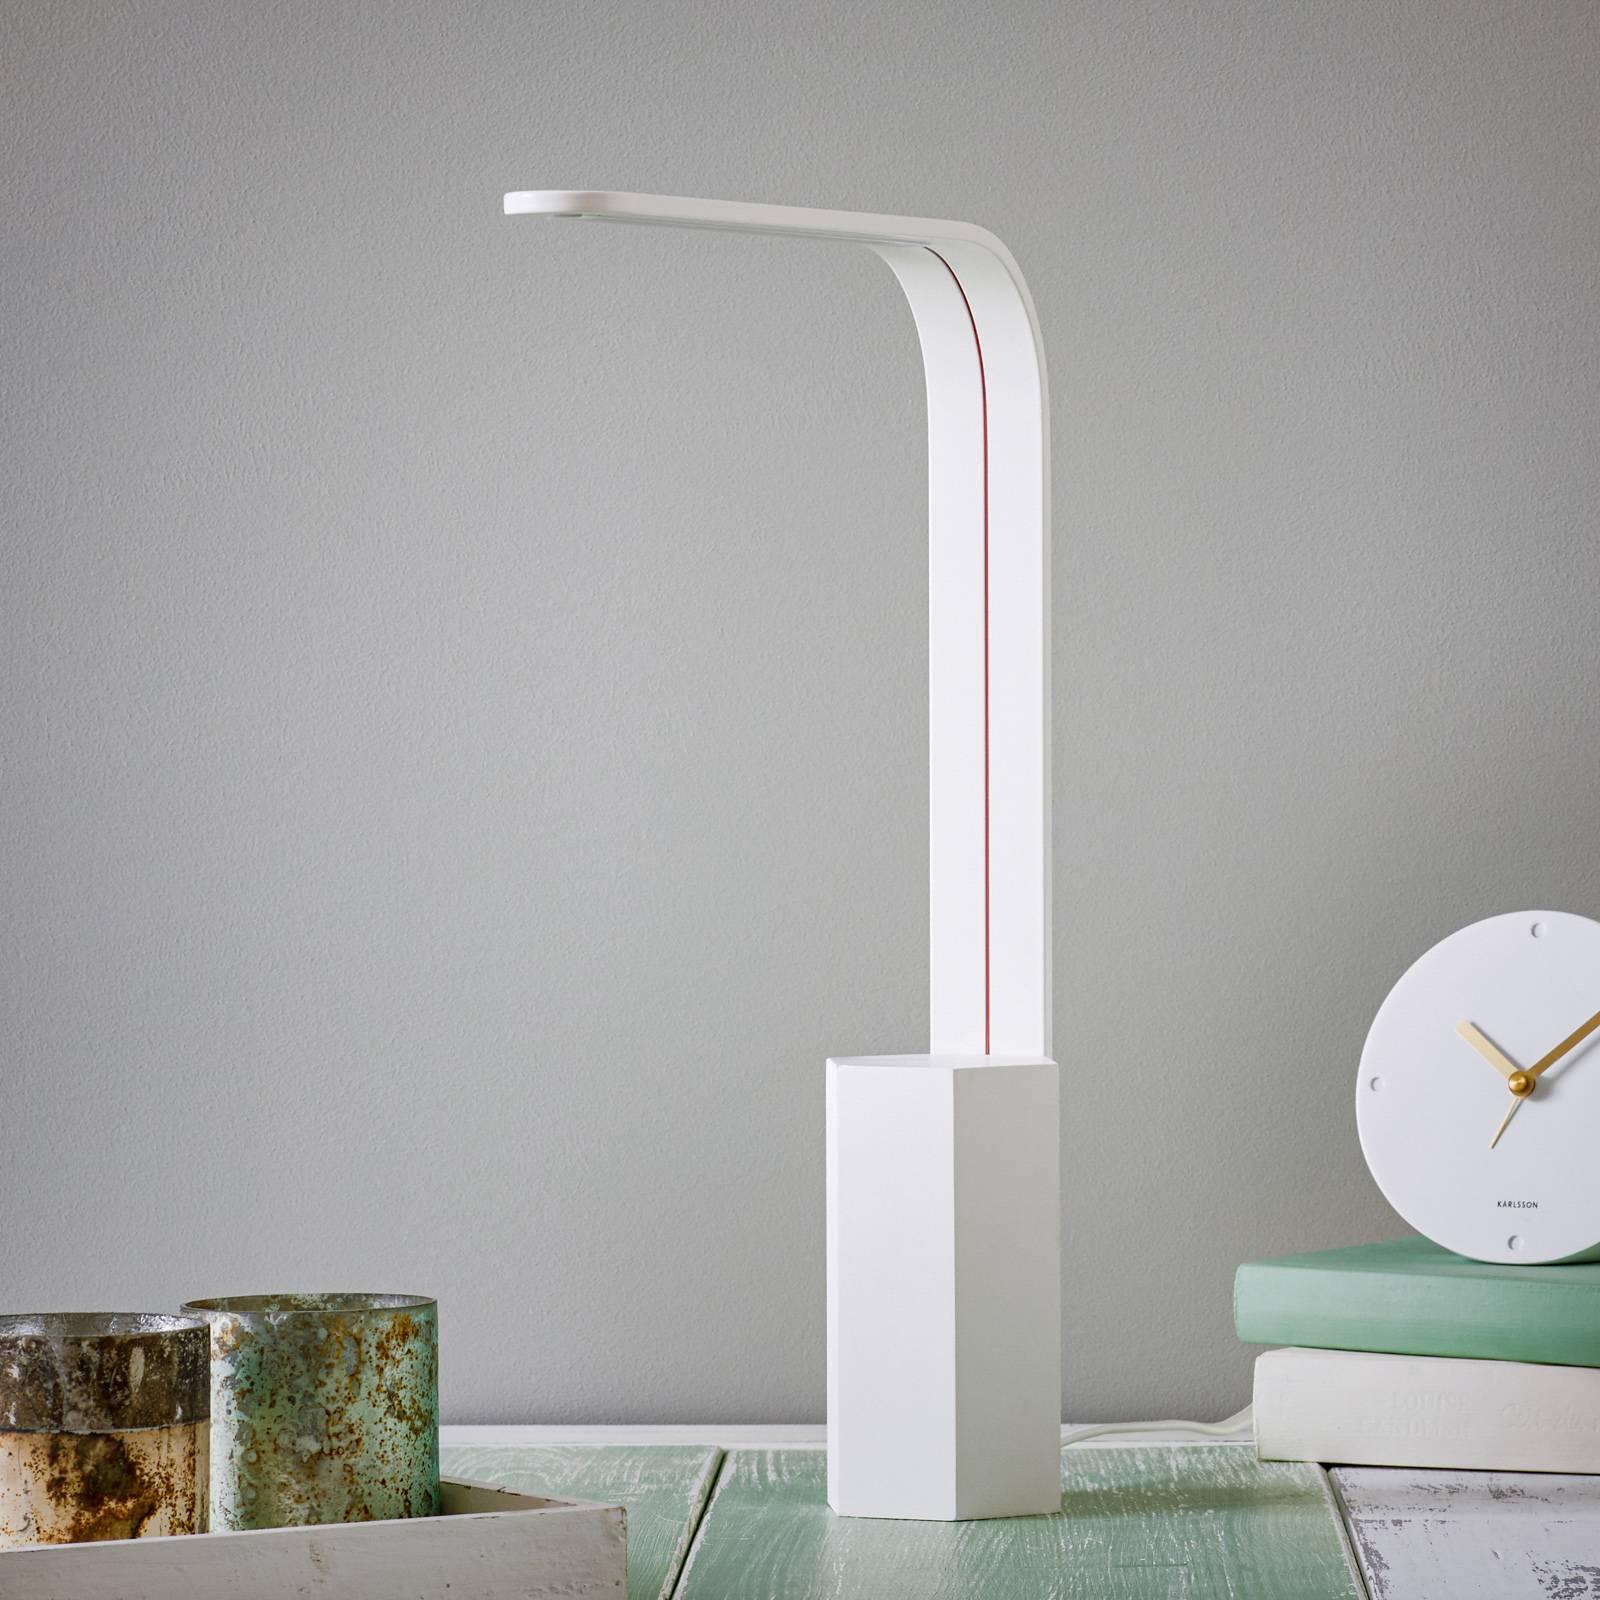 Design-LED-pöytävalaisin 5291, 2 700 K